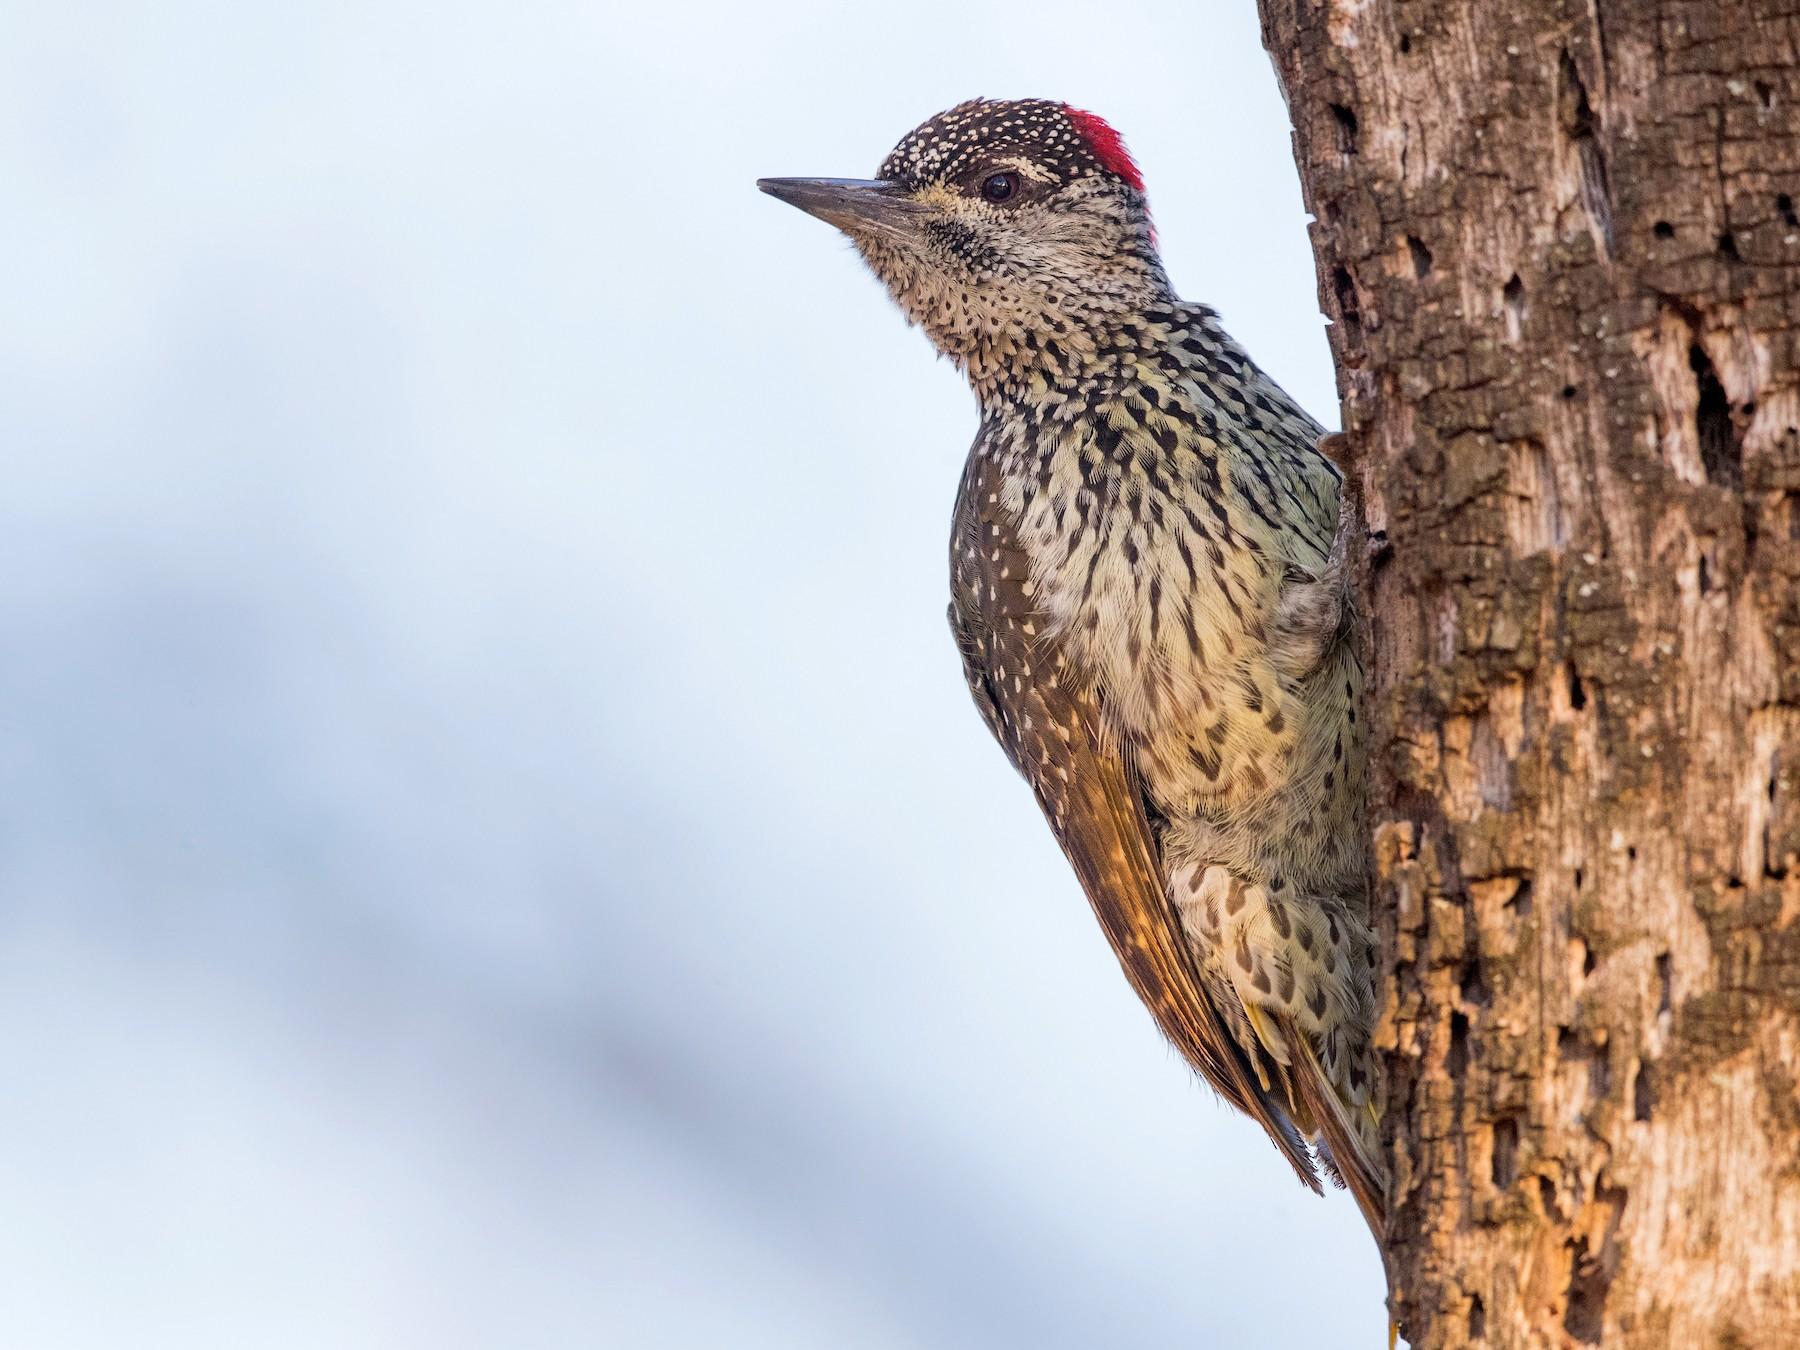 Golden-tailed Woodpecker - David Irving